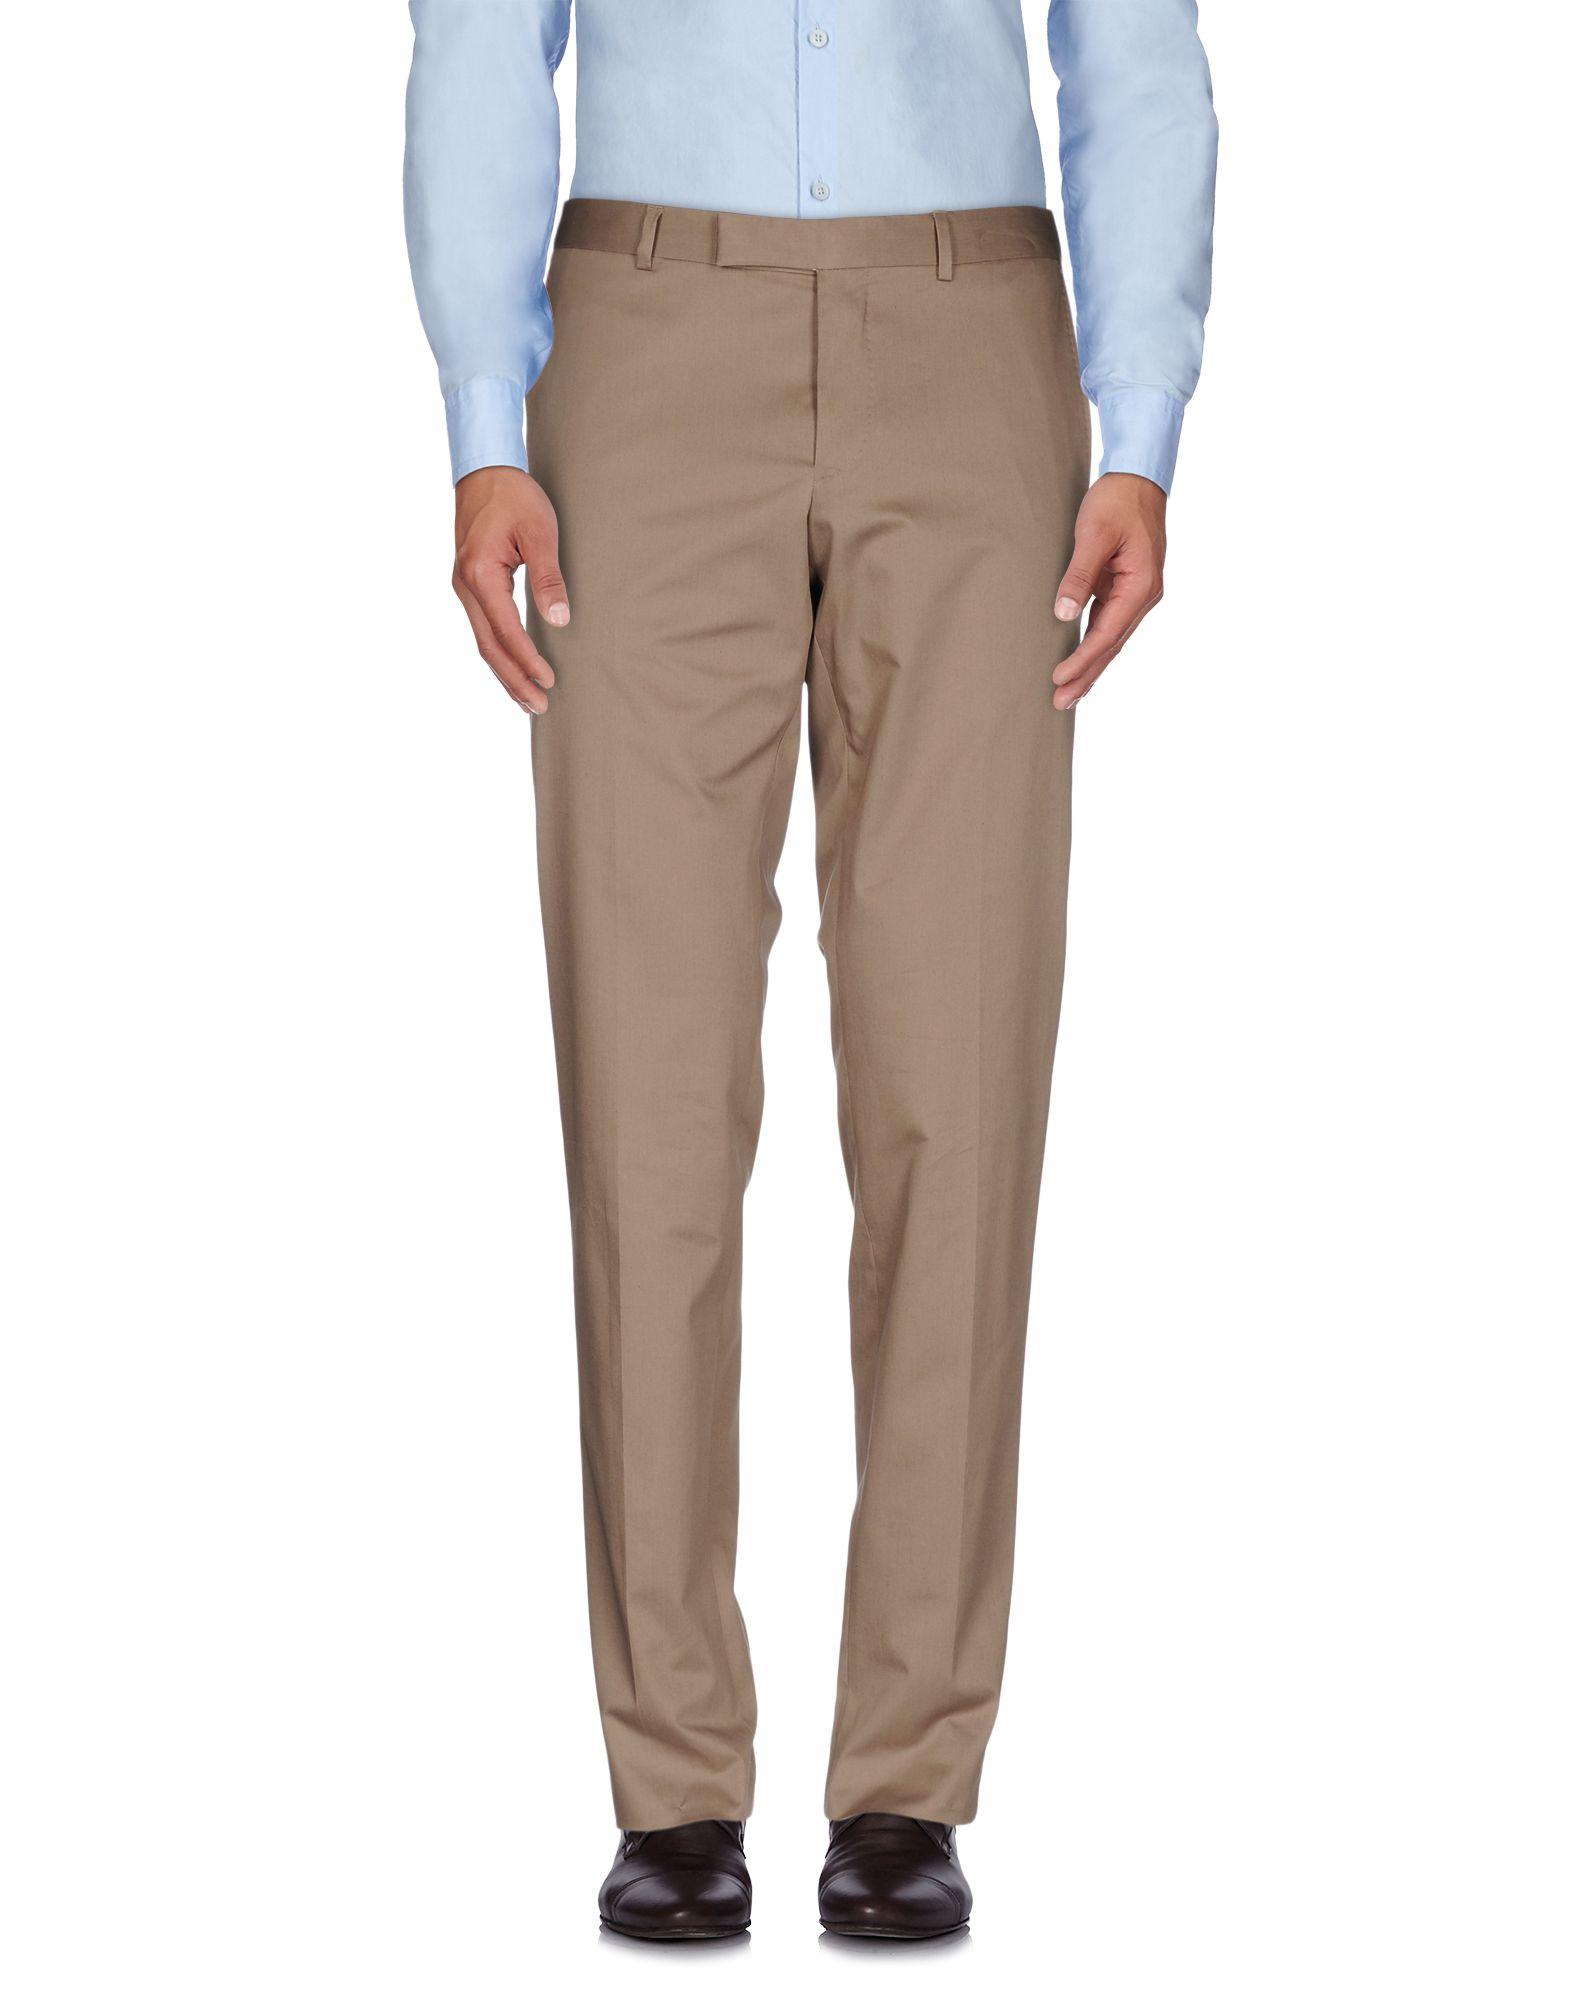 6f92aeda7b17 29 Perfect Casual Khaki Outfit | cabeqq.com